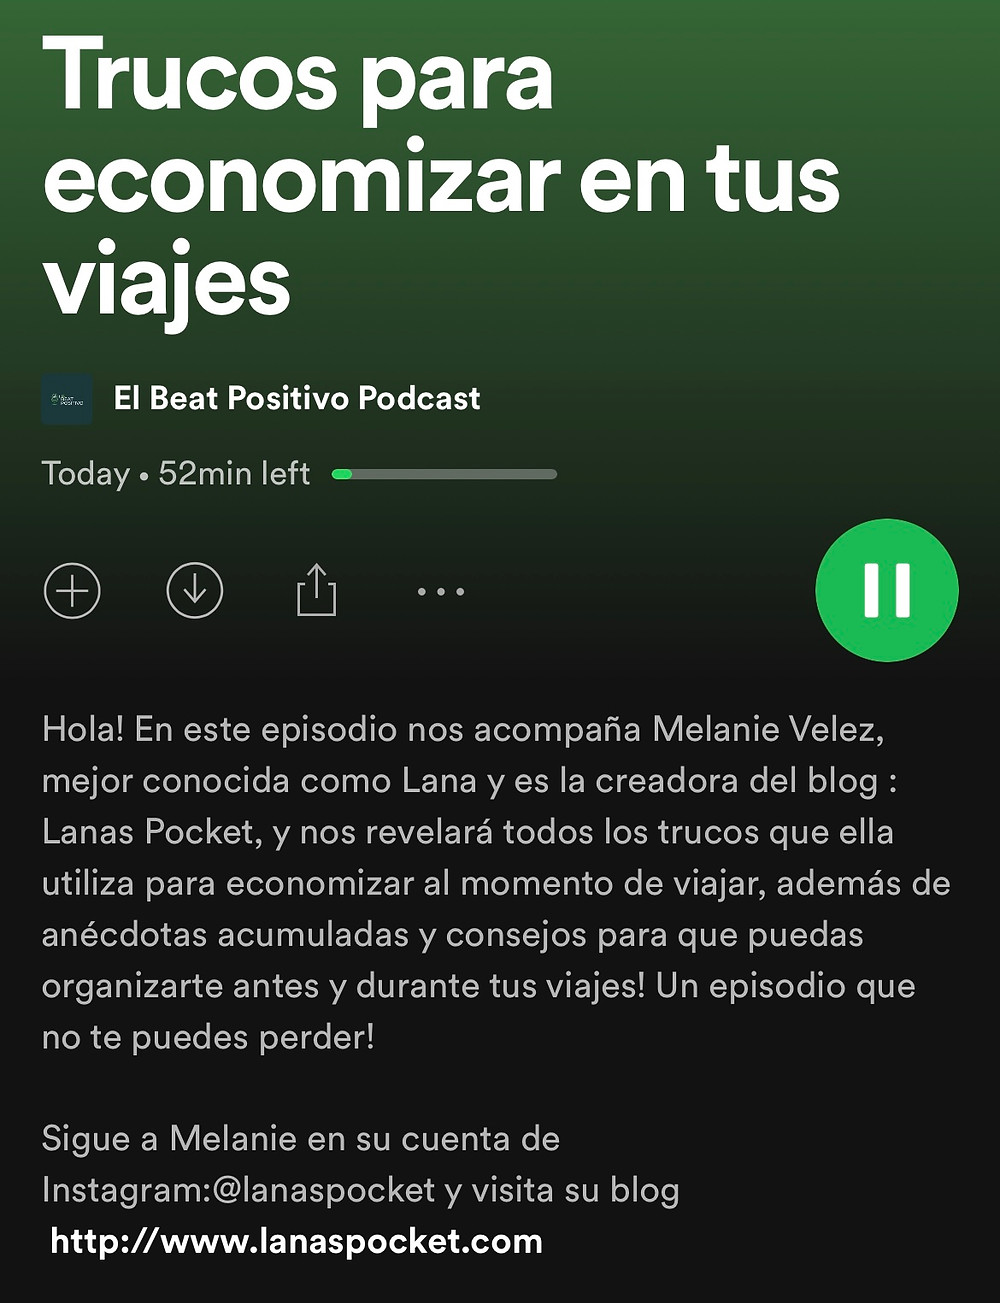 El Bead Positivo Podcast